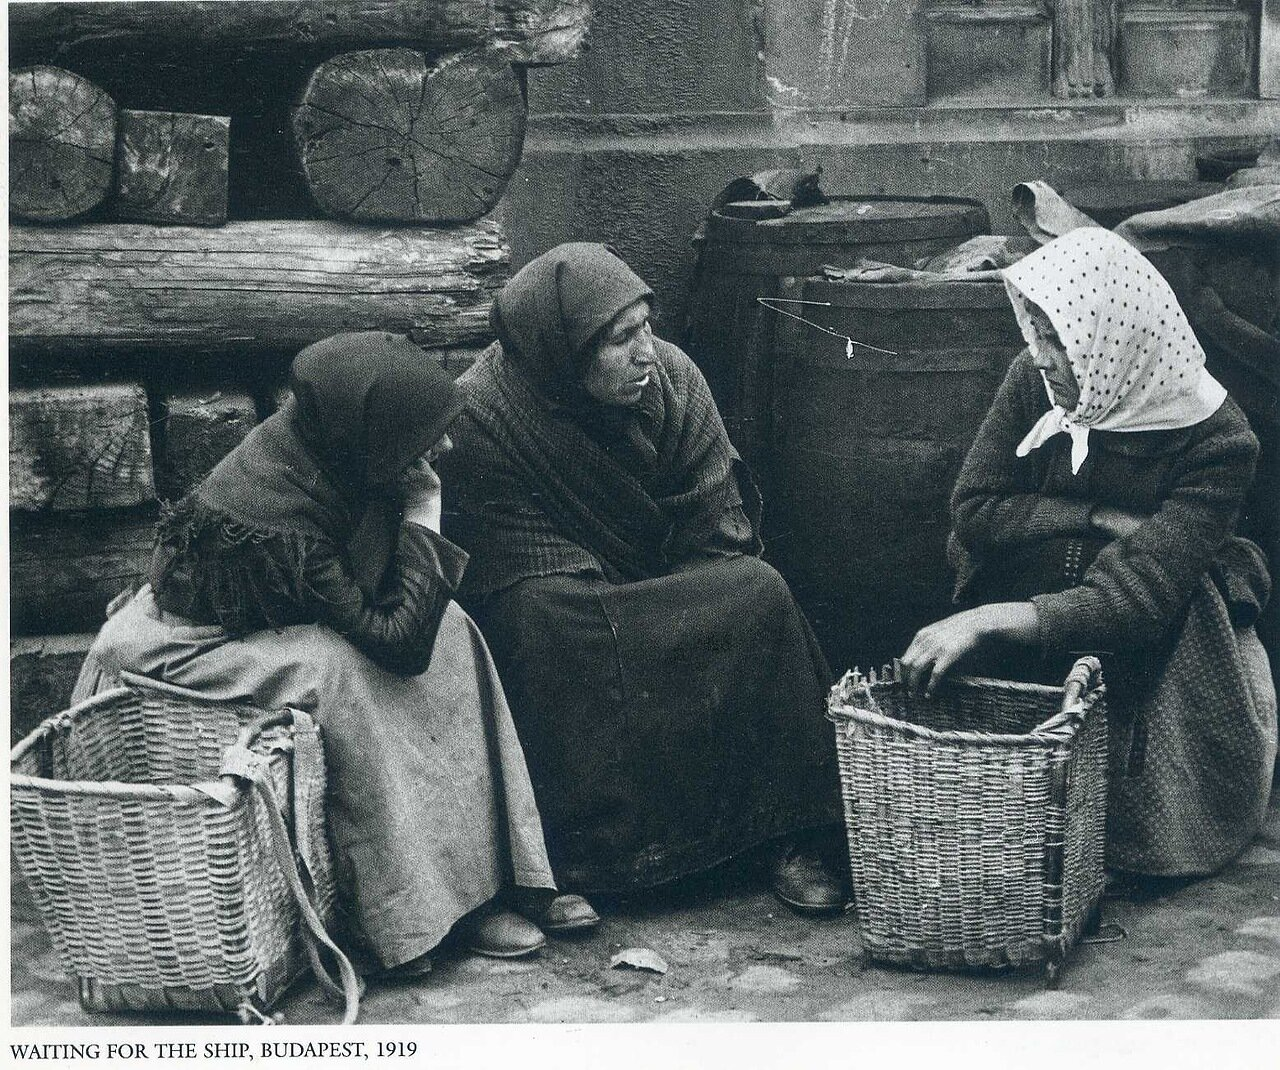 В ожидании судна, Будапешт, 1919